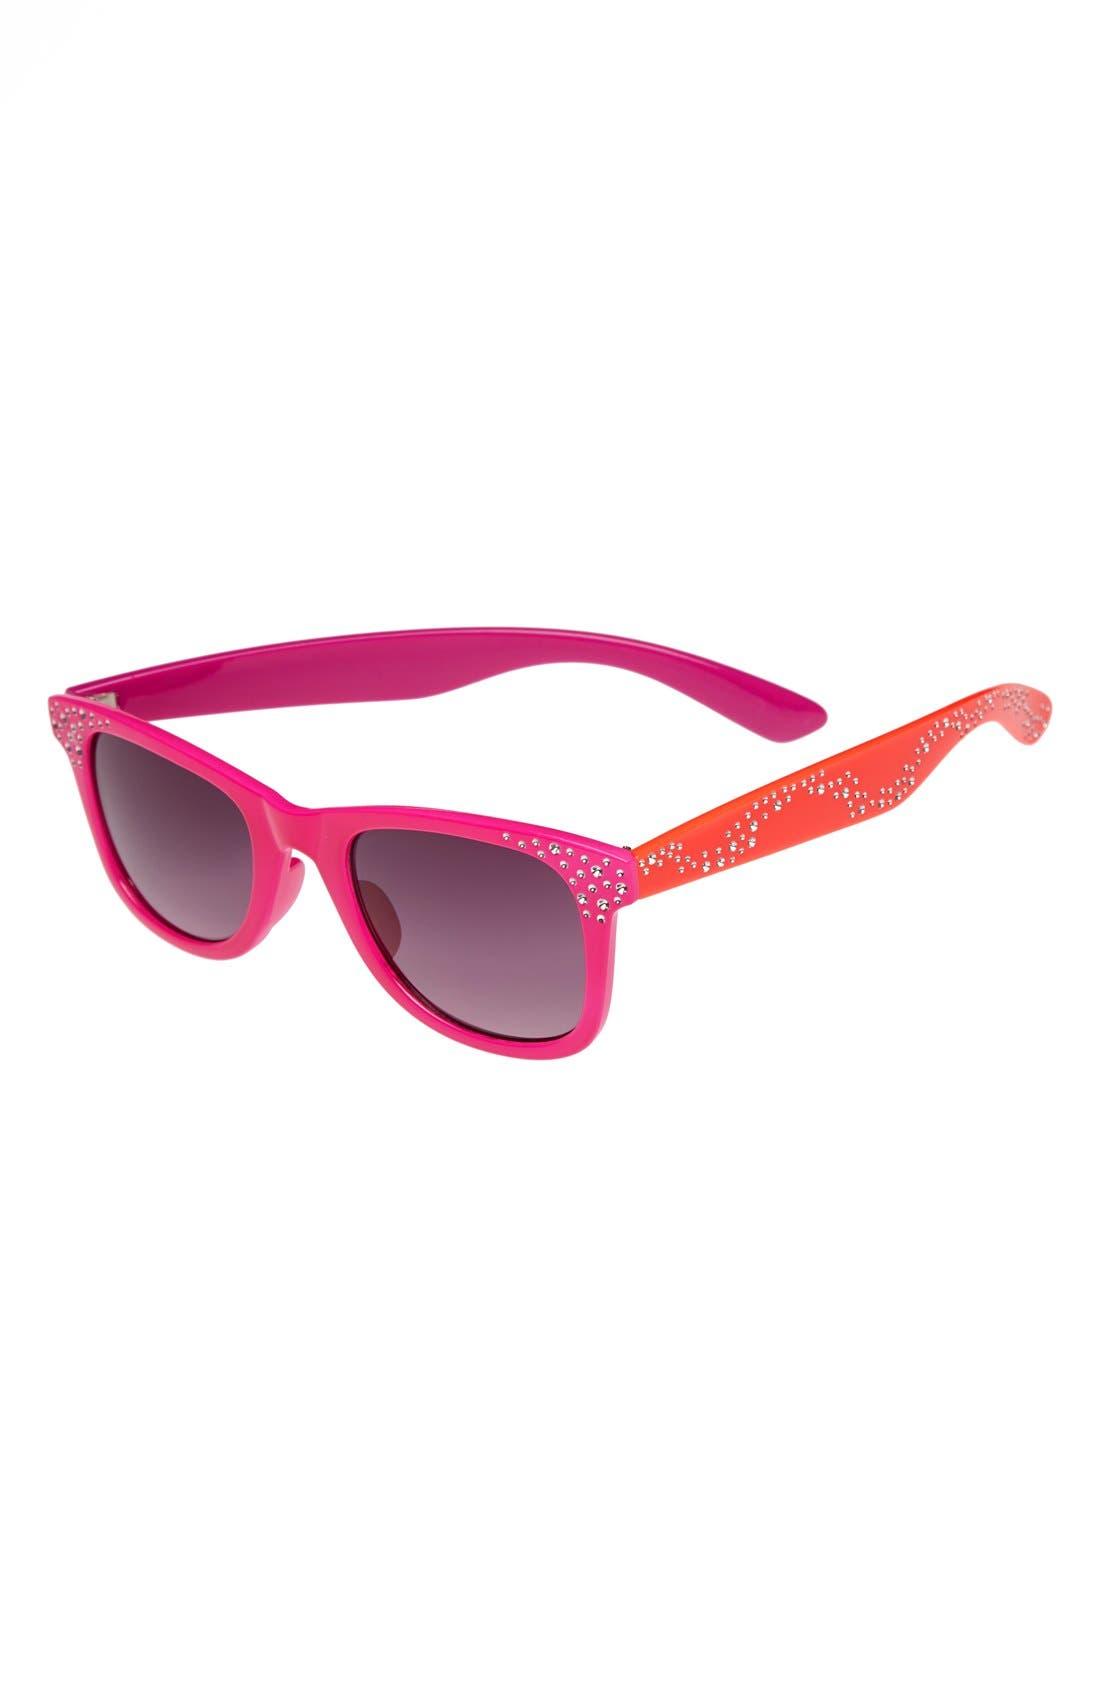 Main Image - Fantas Eyes Retro Sunglasses (Girls)